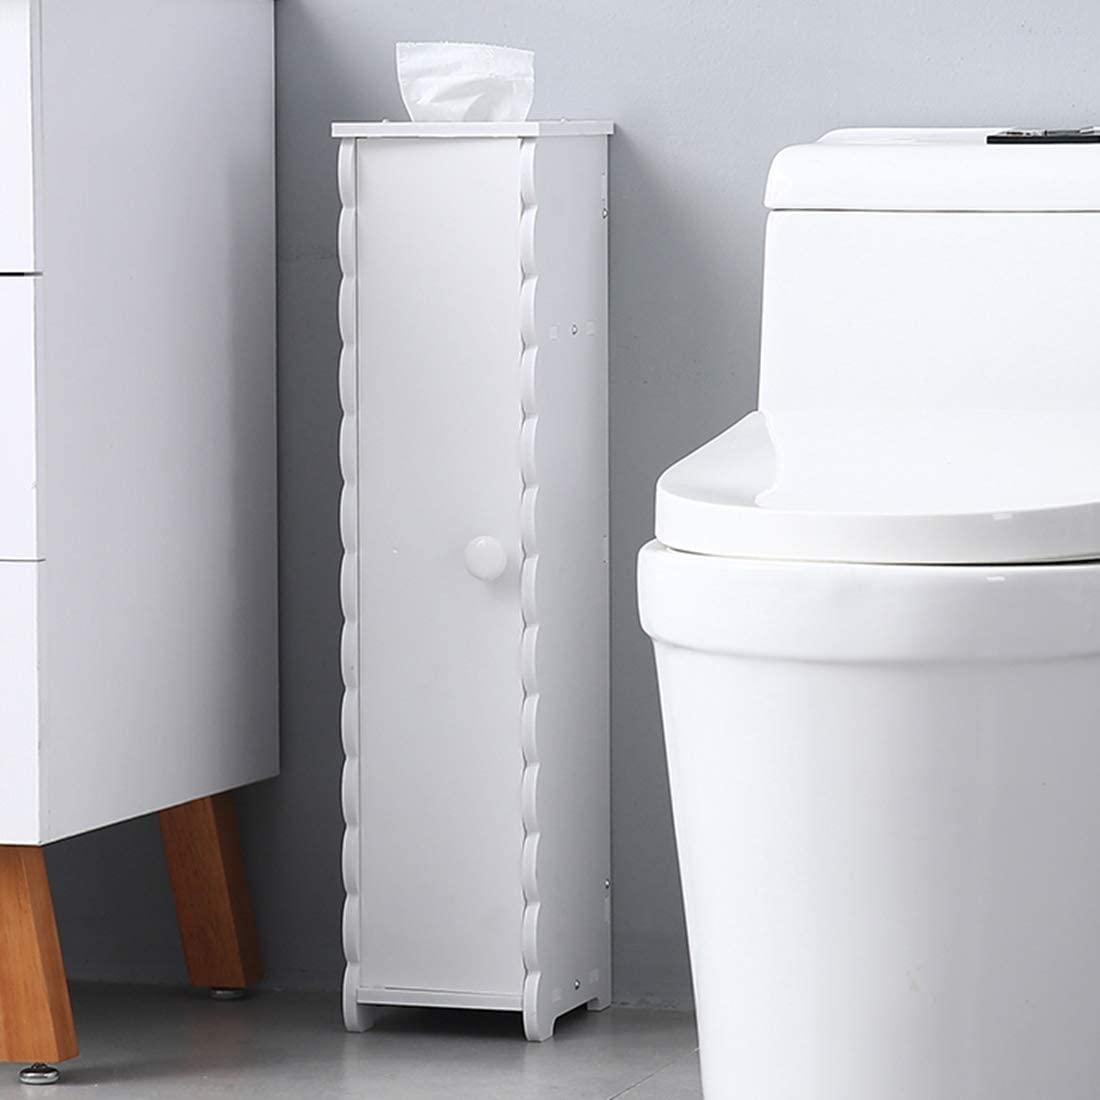 Storage Narrow Cabinet Bathroom Floor Standing High with Shelves and Doors Towel Storage Shelf for Paper Holder (6.5 x 7.7 x 26.5)